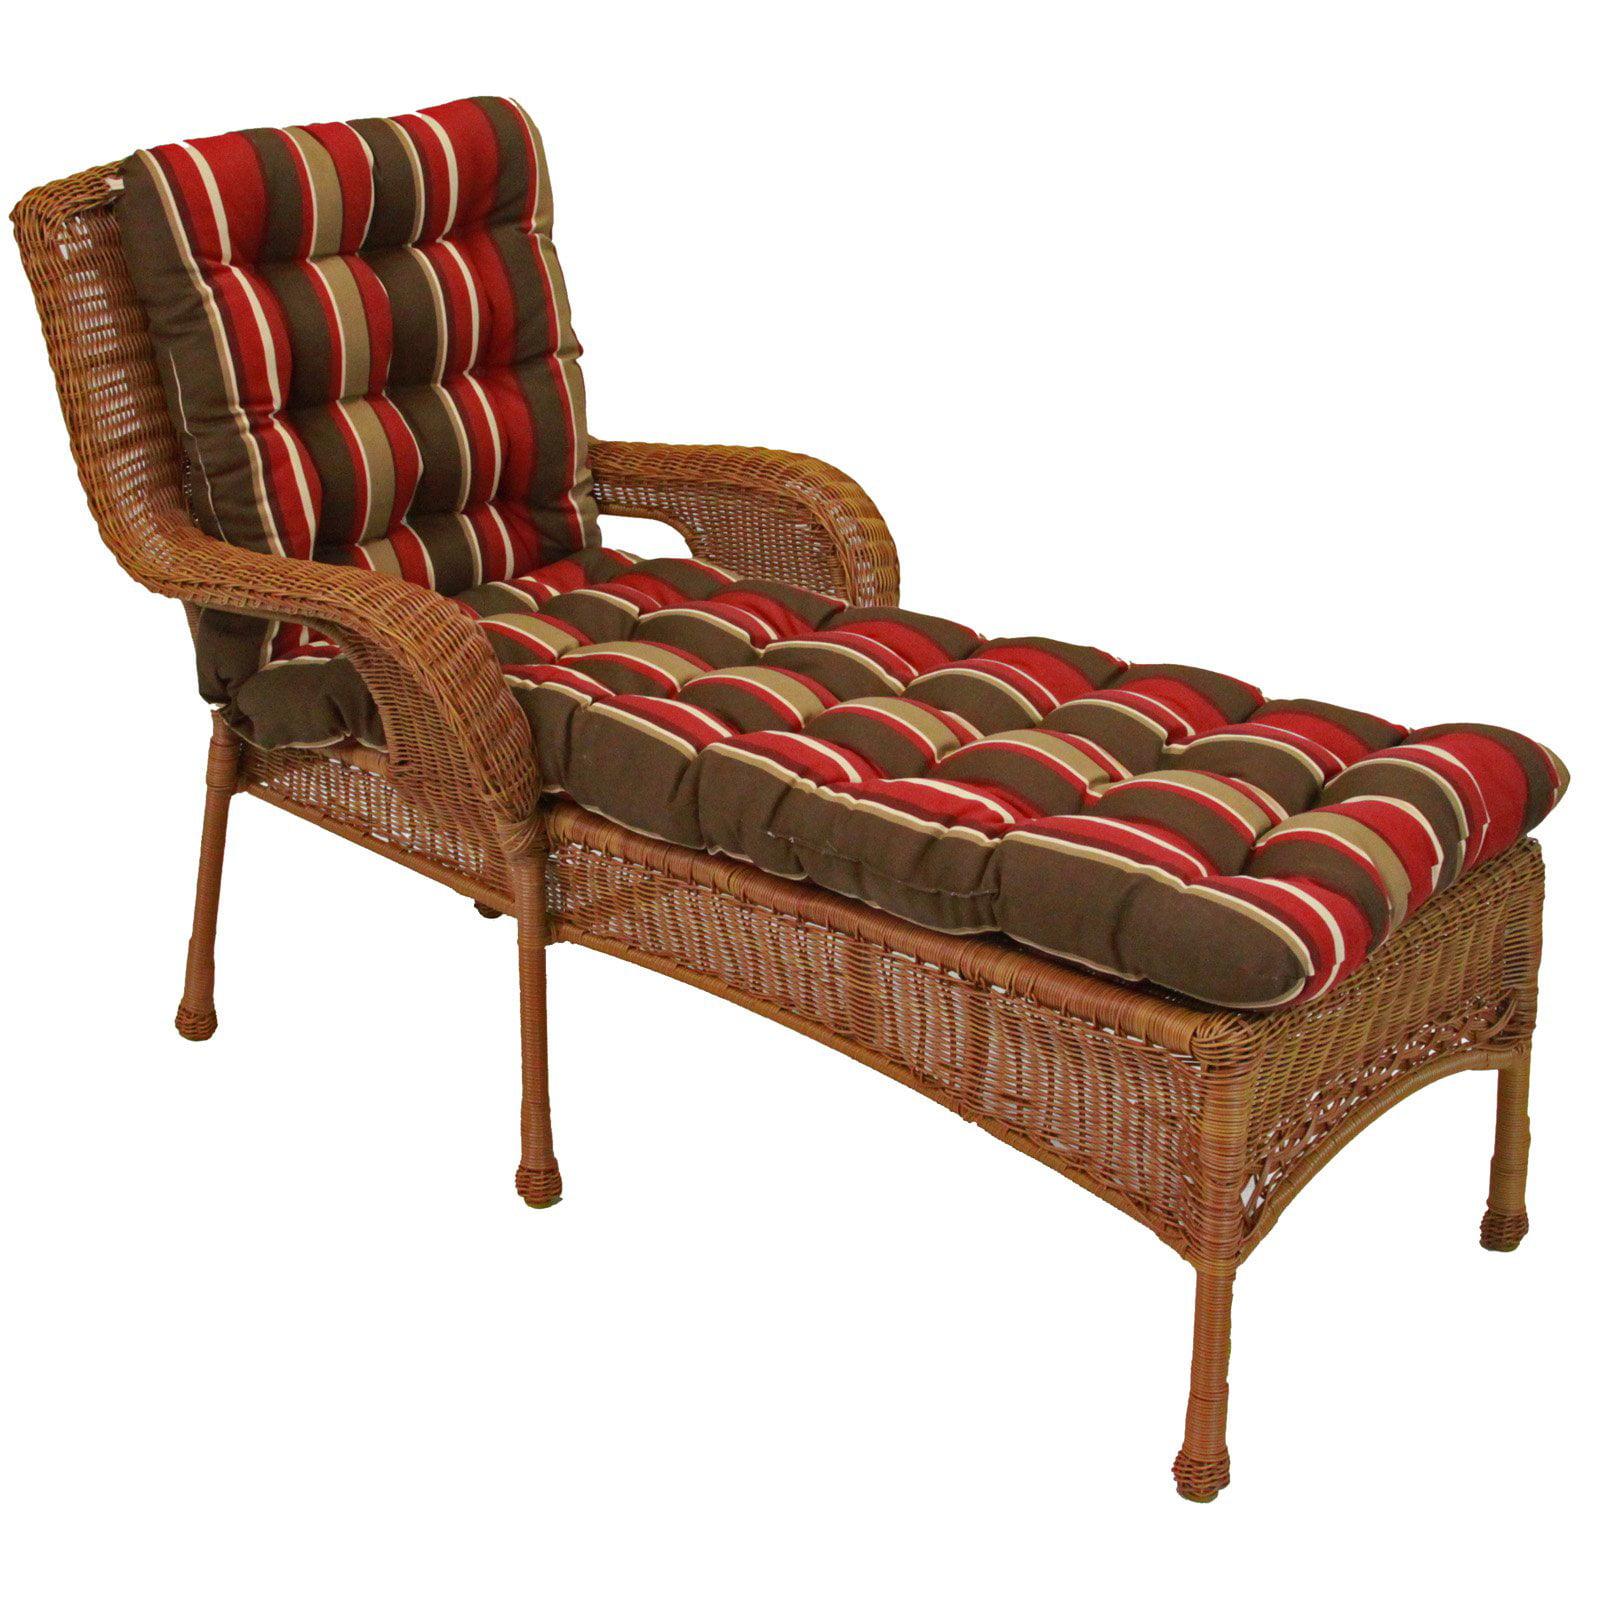 Outdoor chaise lounge cushion walmart com